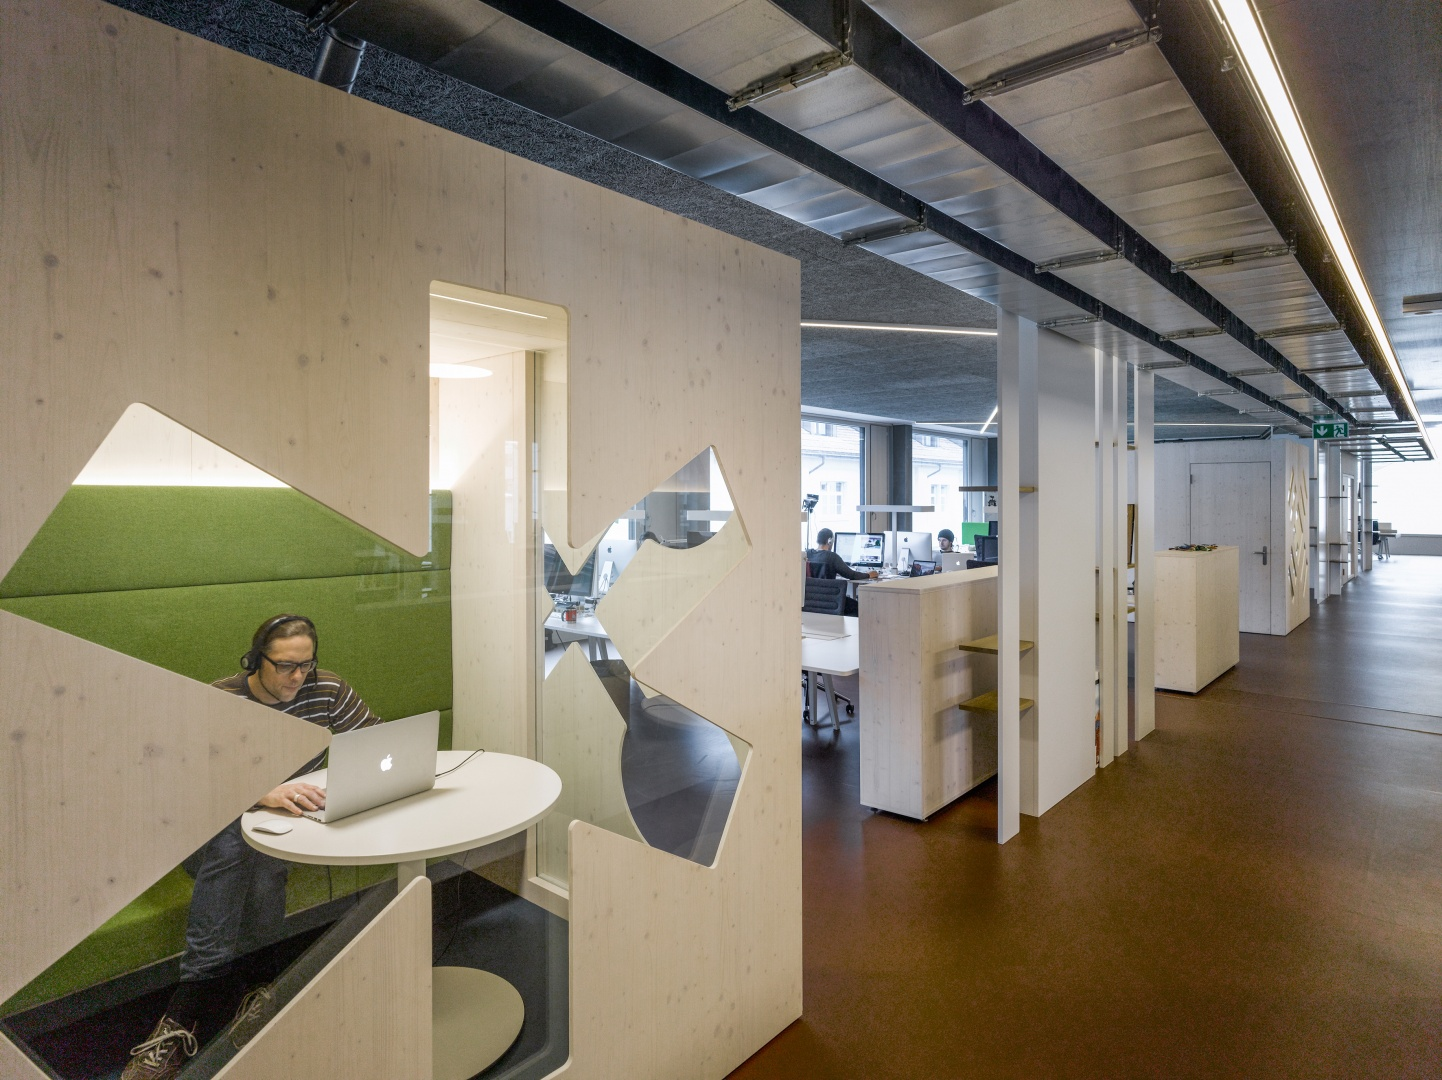 Büros 2. Obergeschoss © Johannes Marburg, Genf